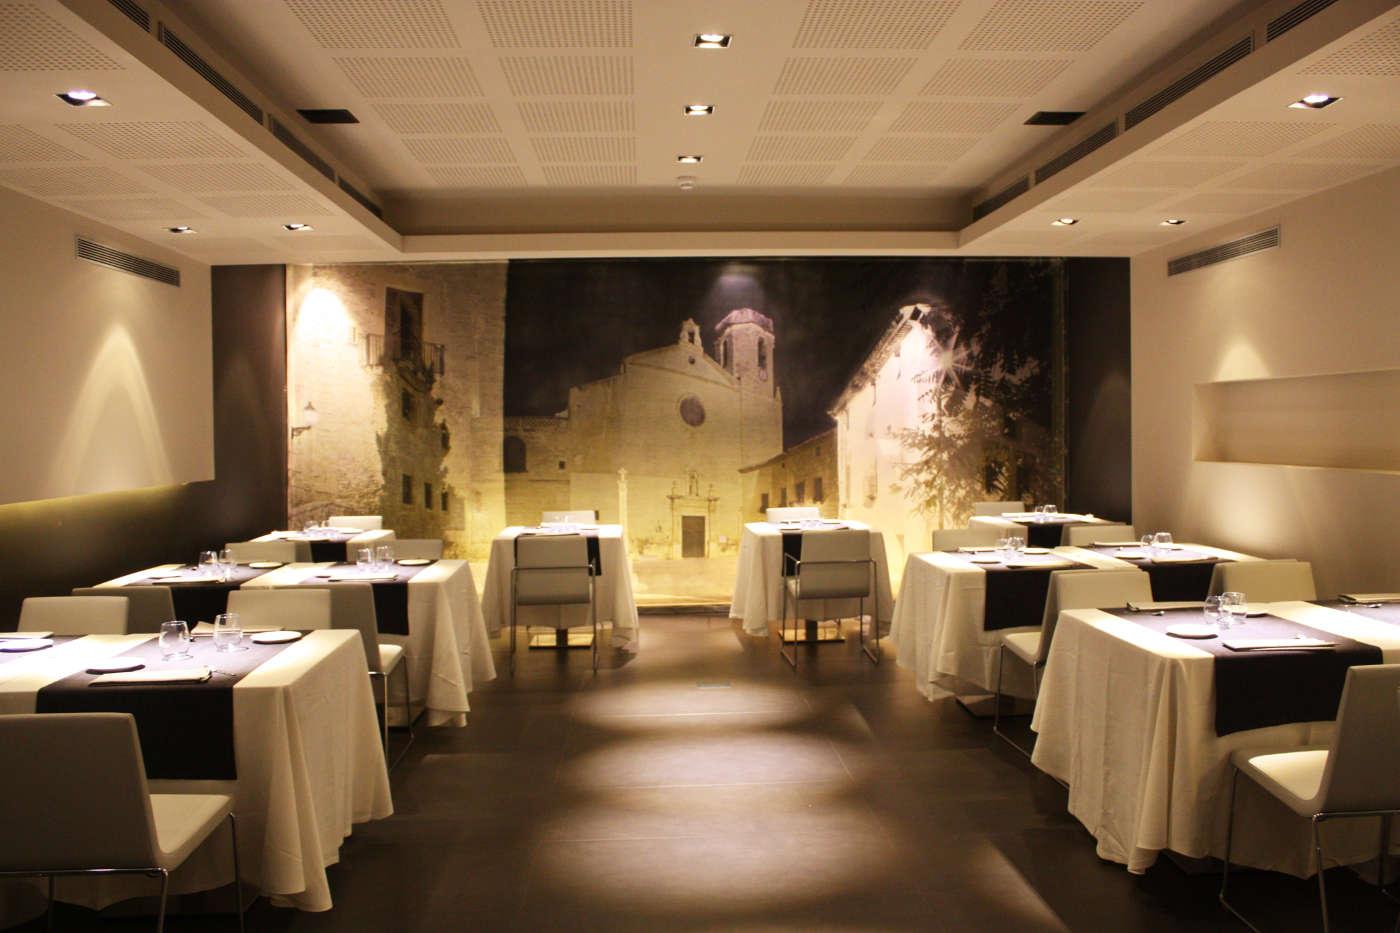 diseño interior restaurantes gloria duran